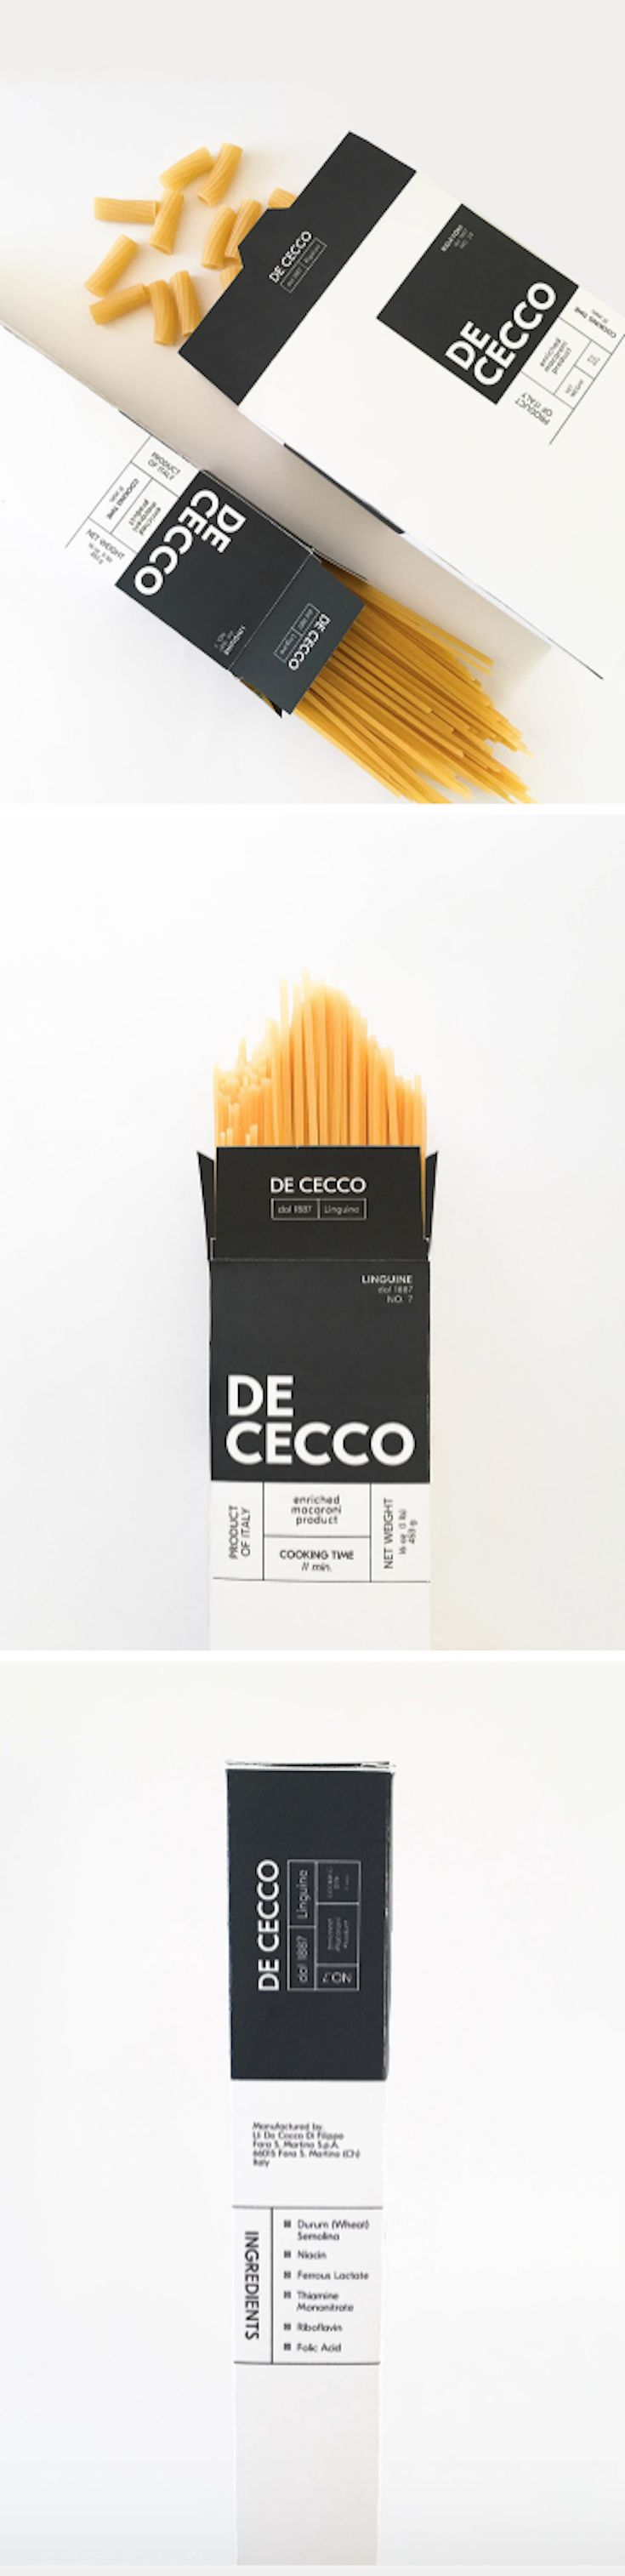 De Cecco Pasta Box packaging by Sarah Lee